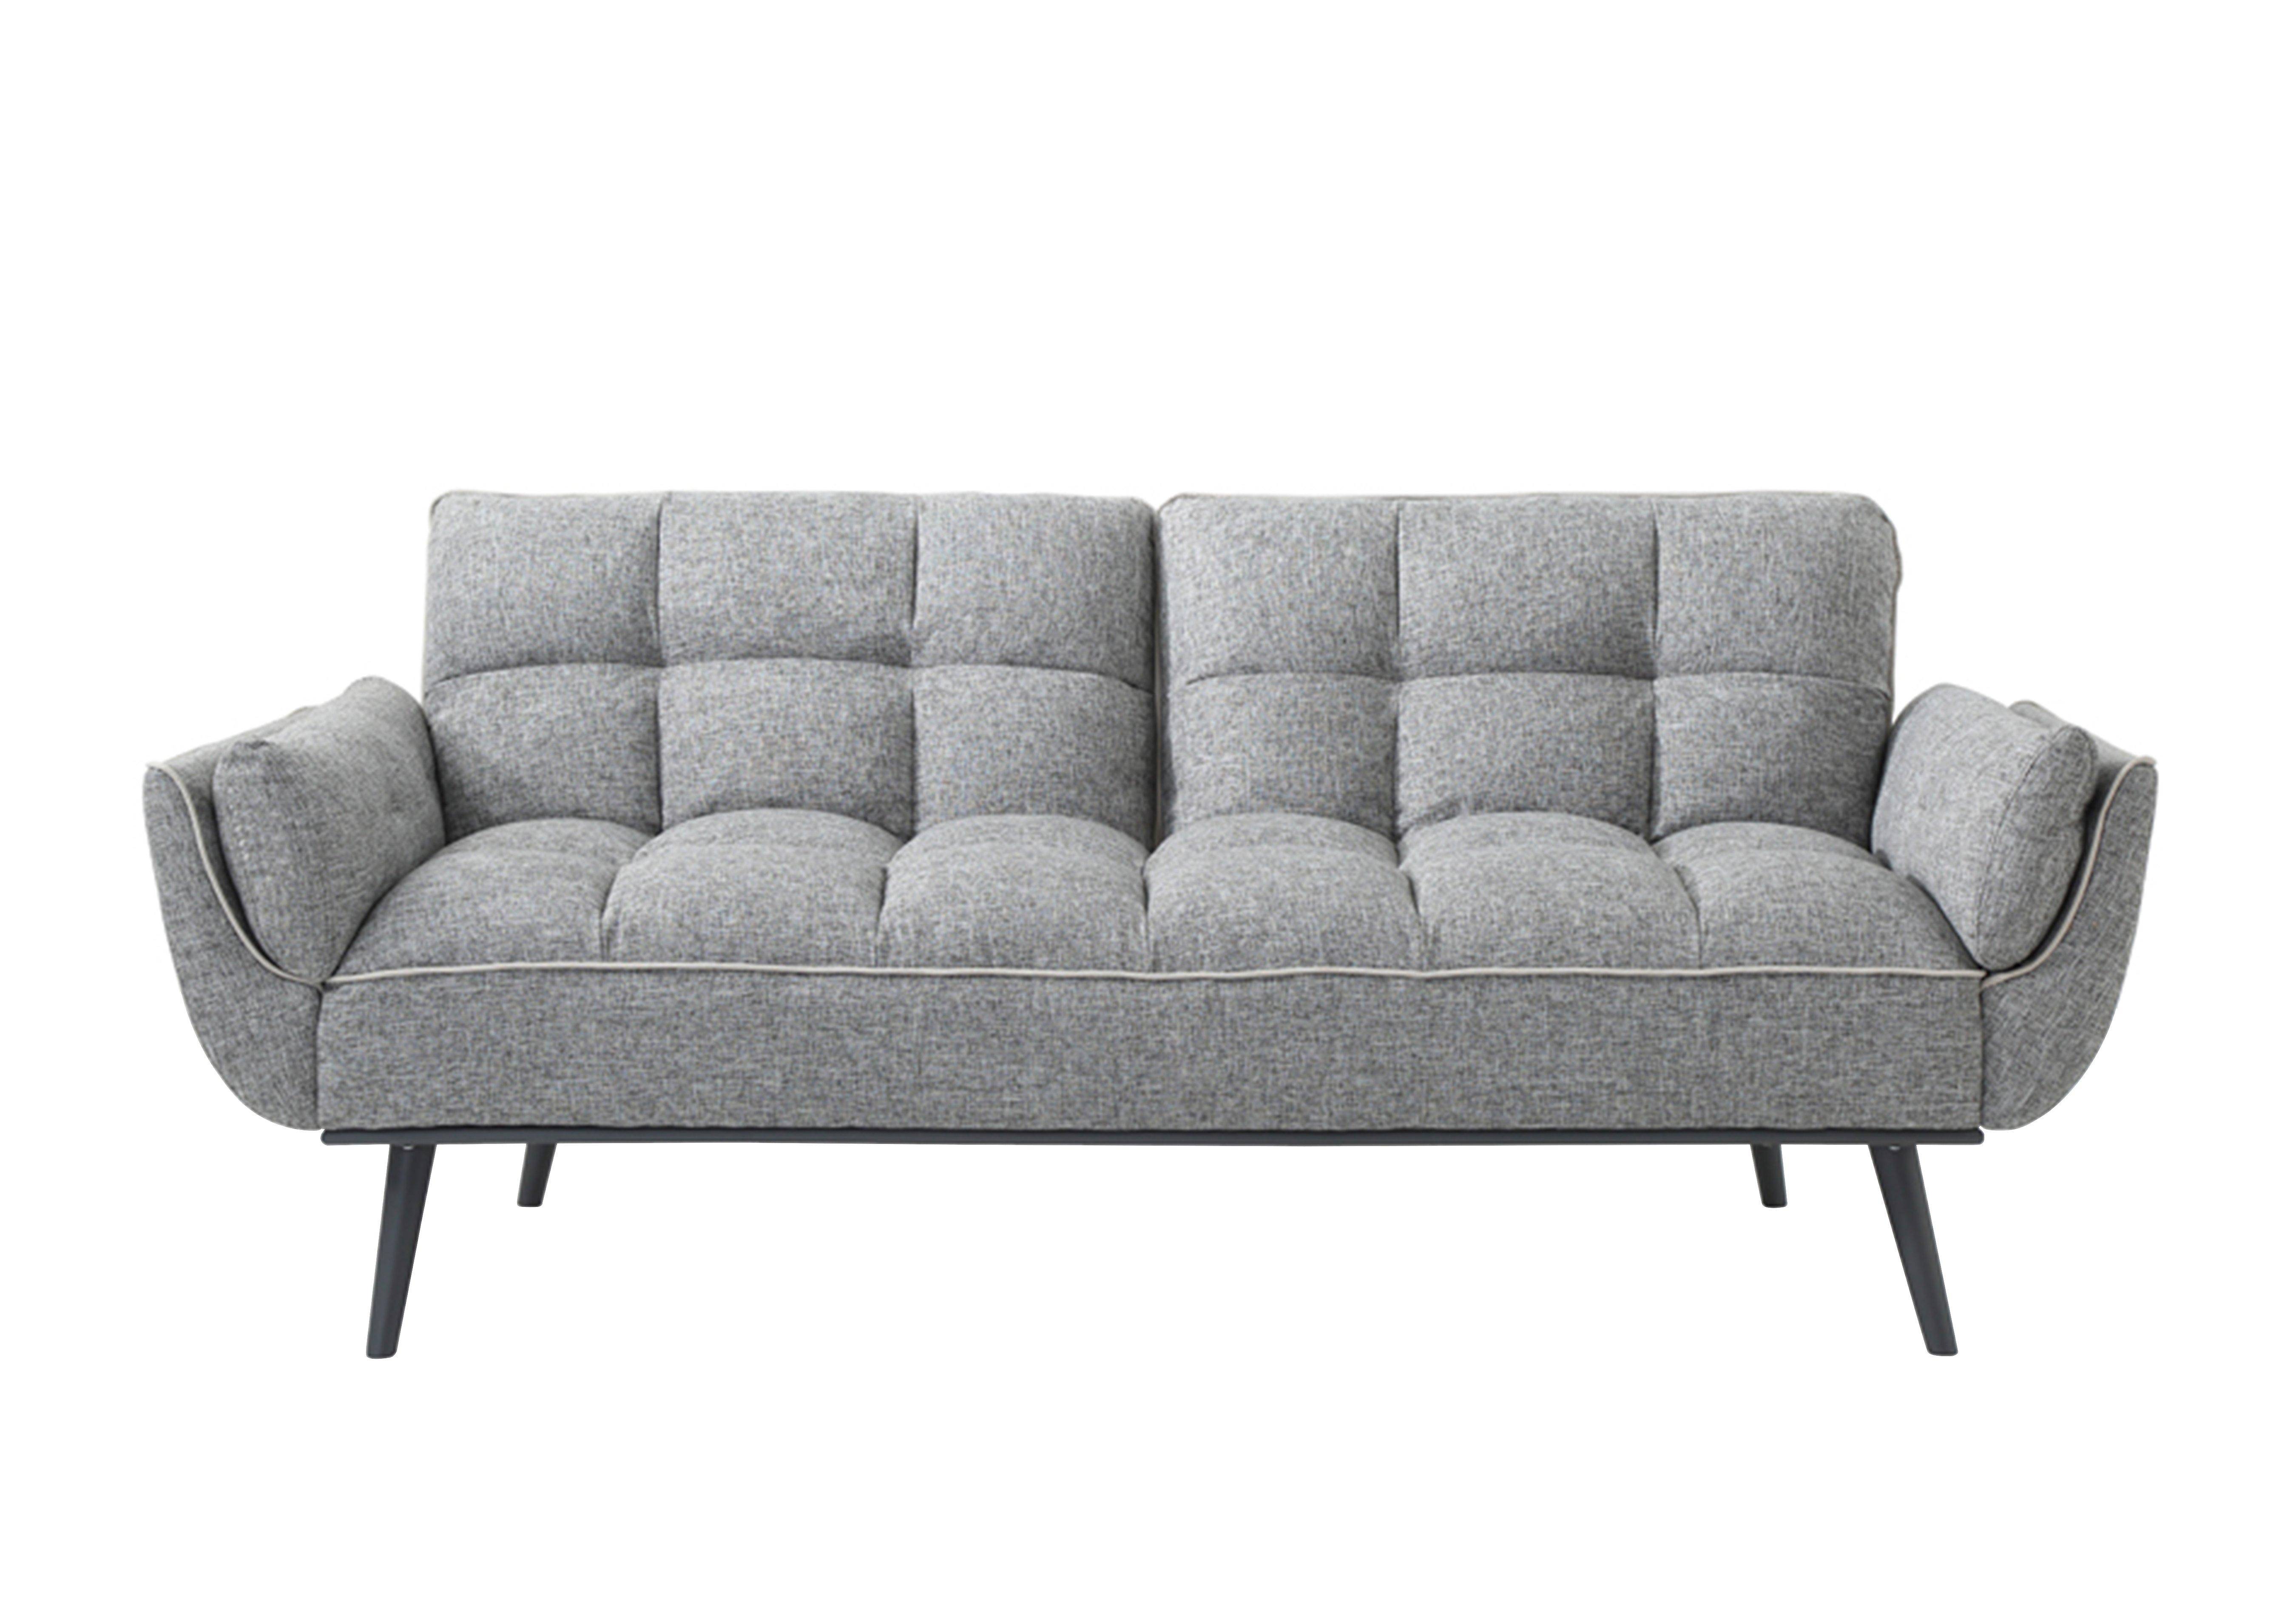 Collette Fabric Sofa Bed Furniture Village